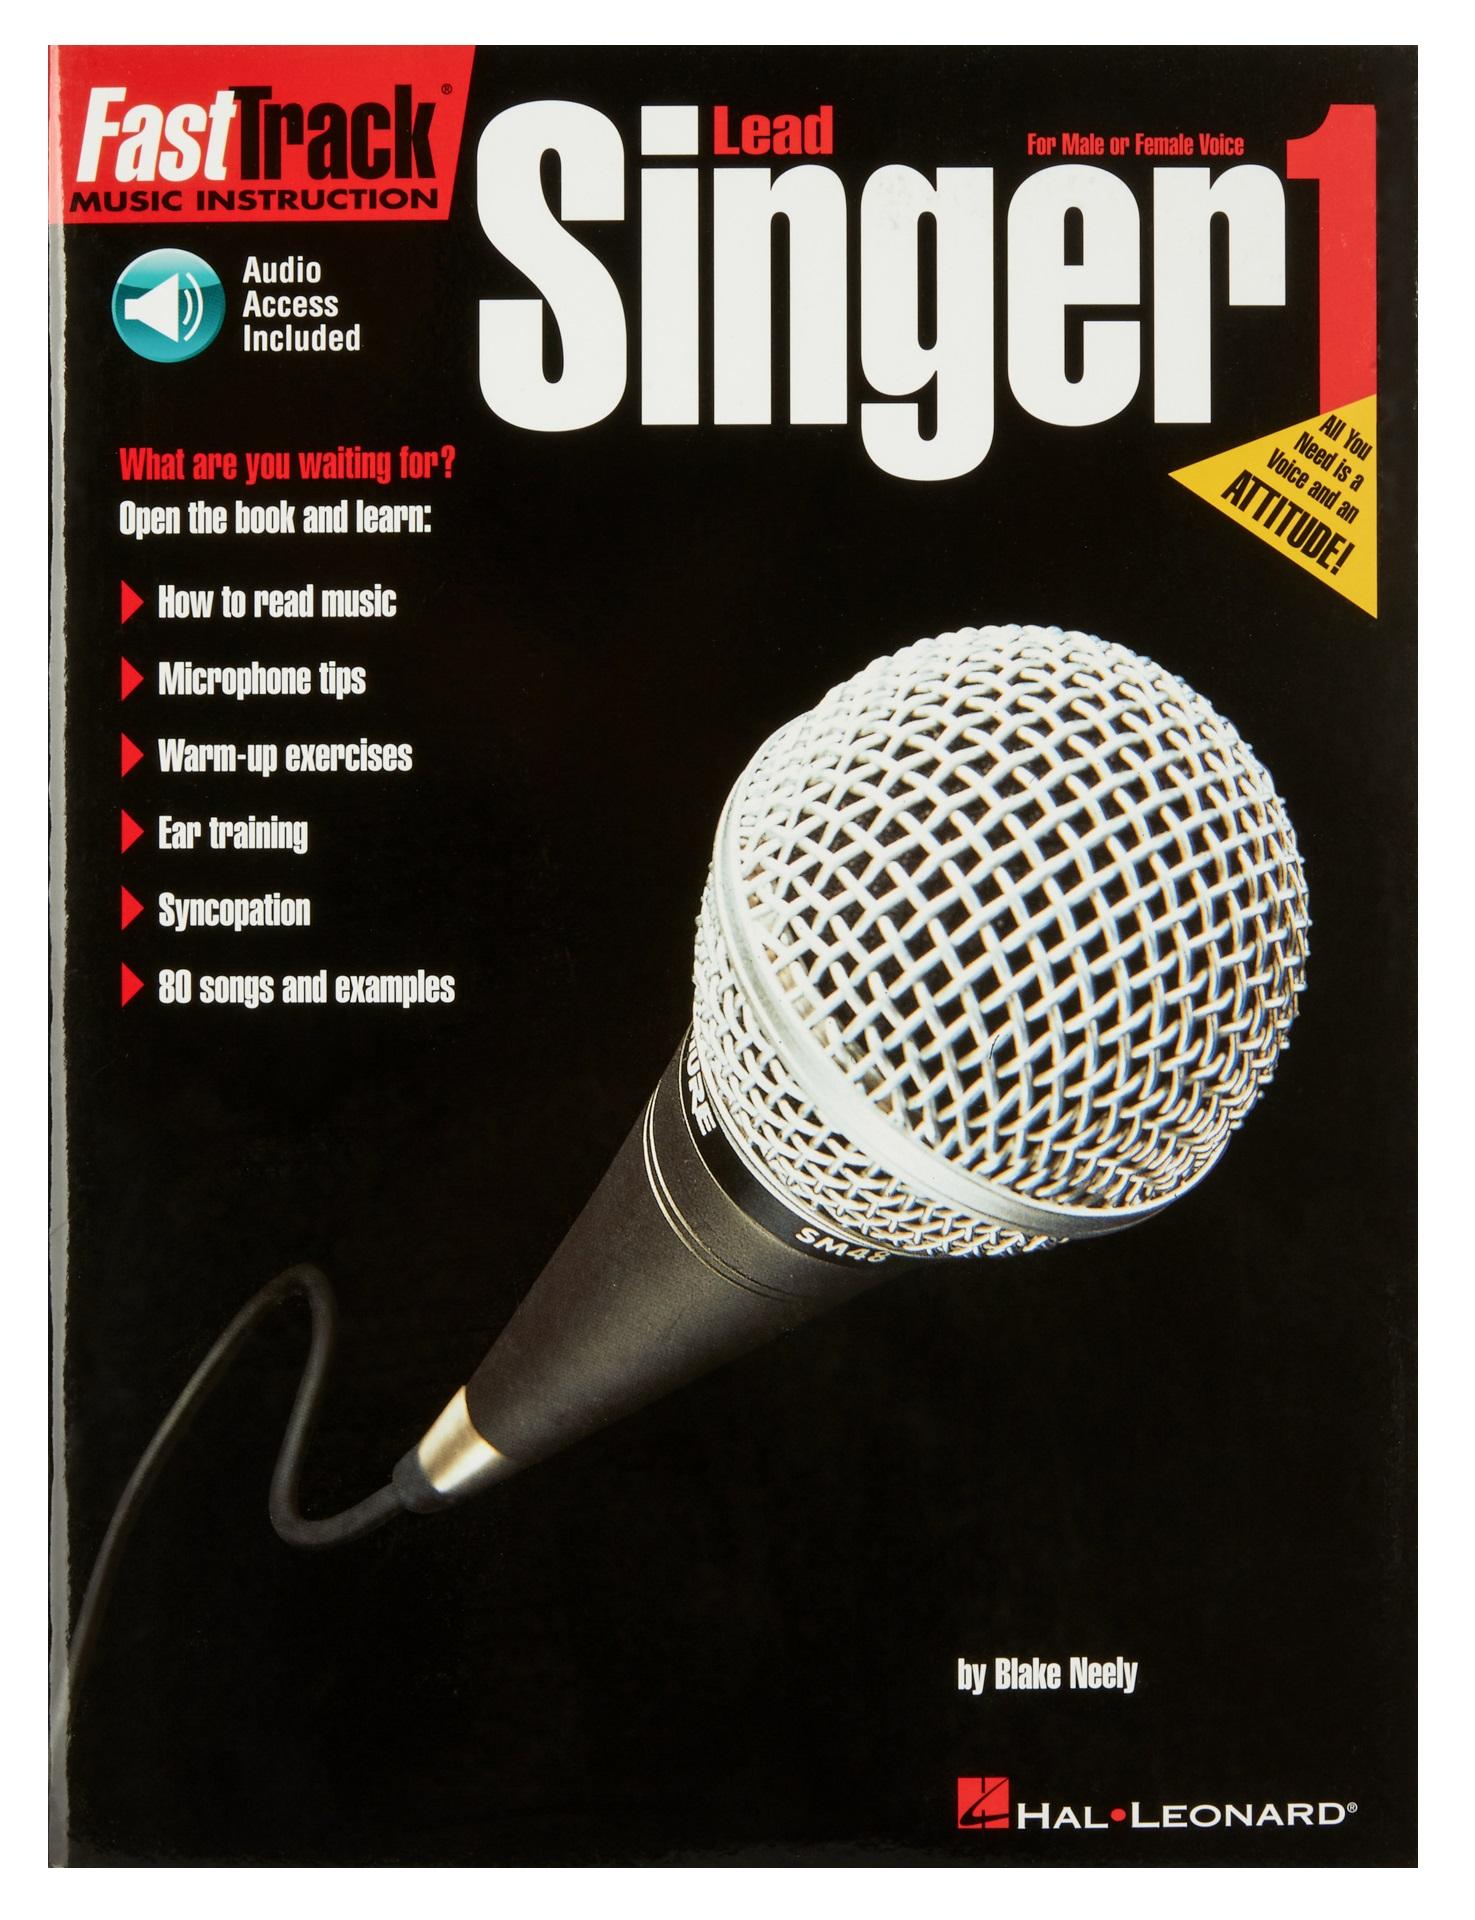 MS Fast Track Lead Singer 1